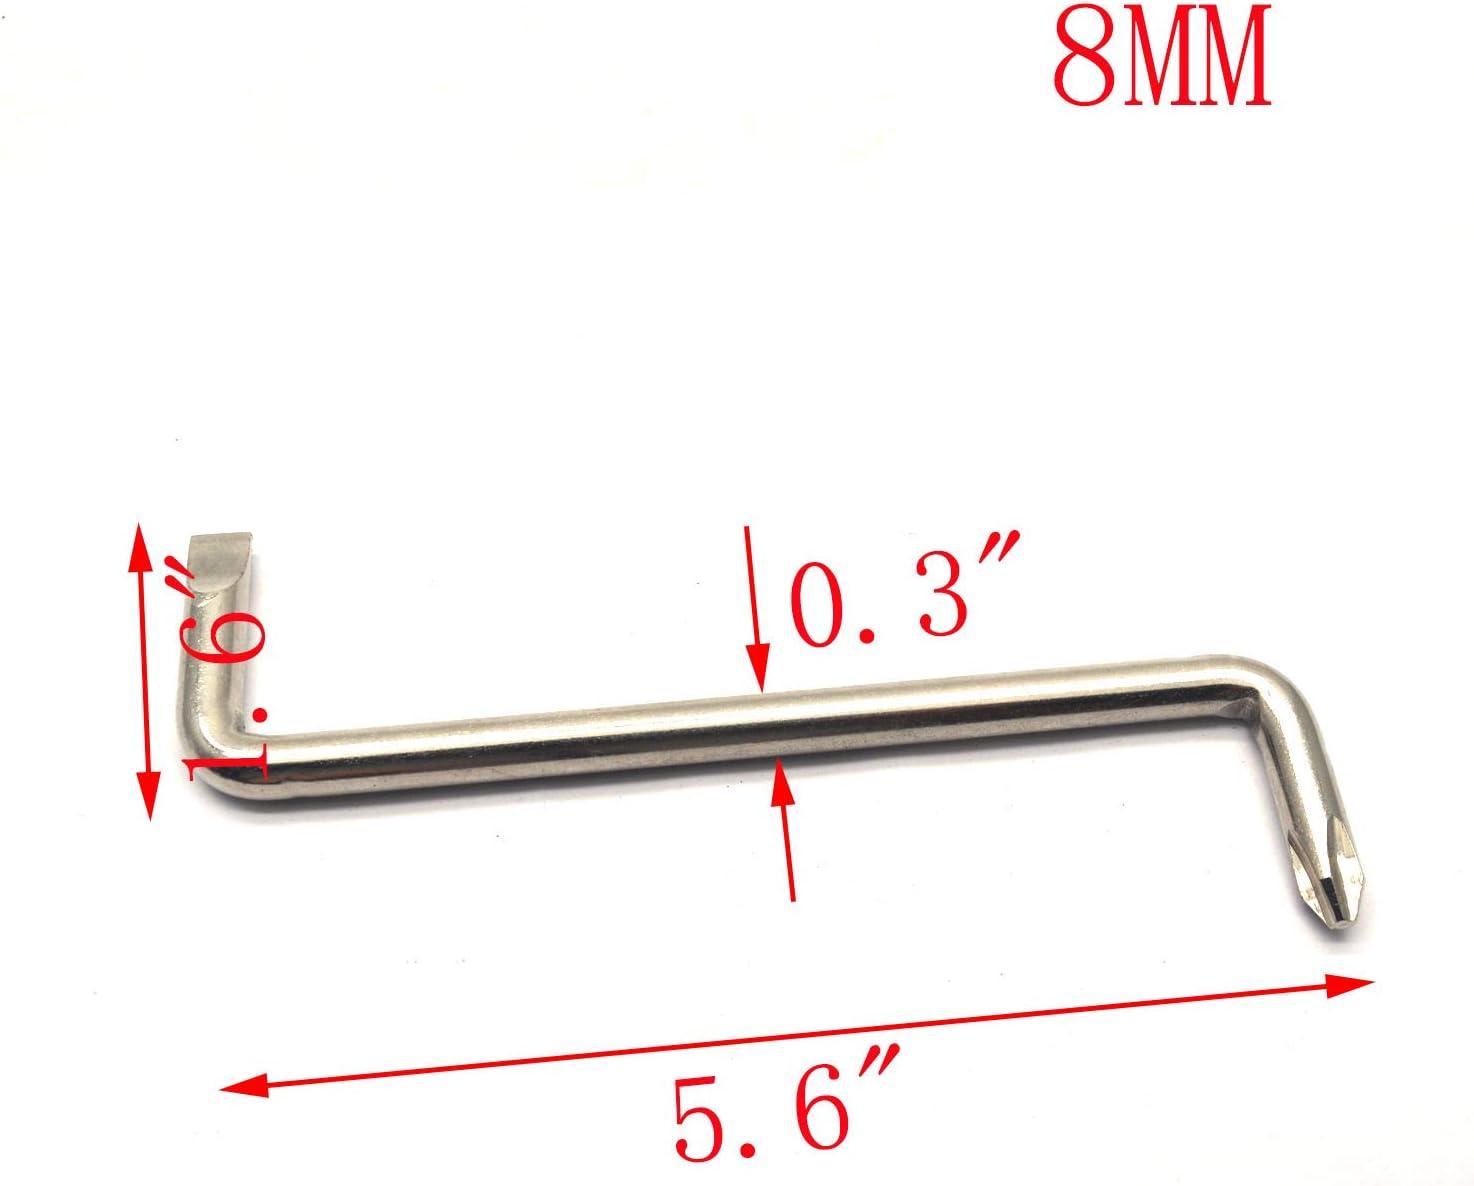 MTMTOOL Steel Short Shank Double Headed Z-type Offset Screwdriver Set Repair Tools Pack of 3